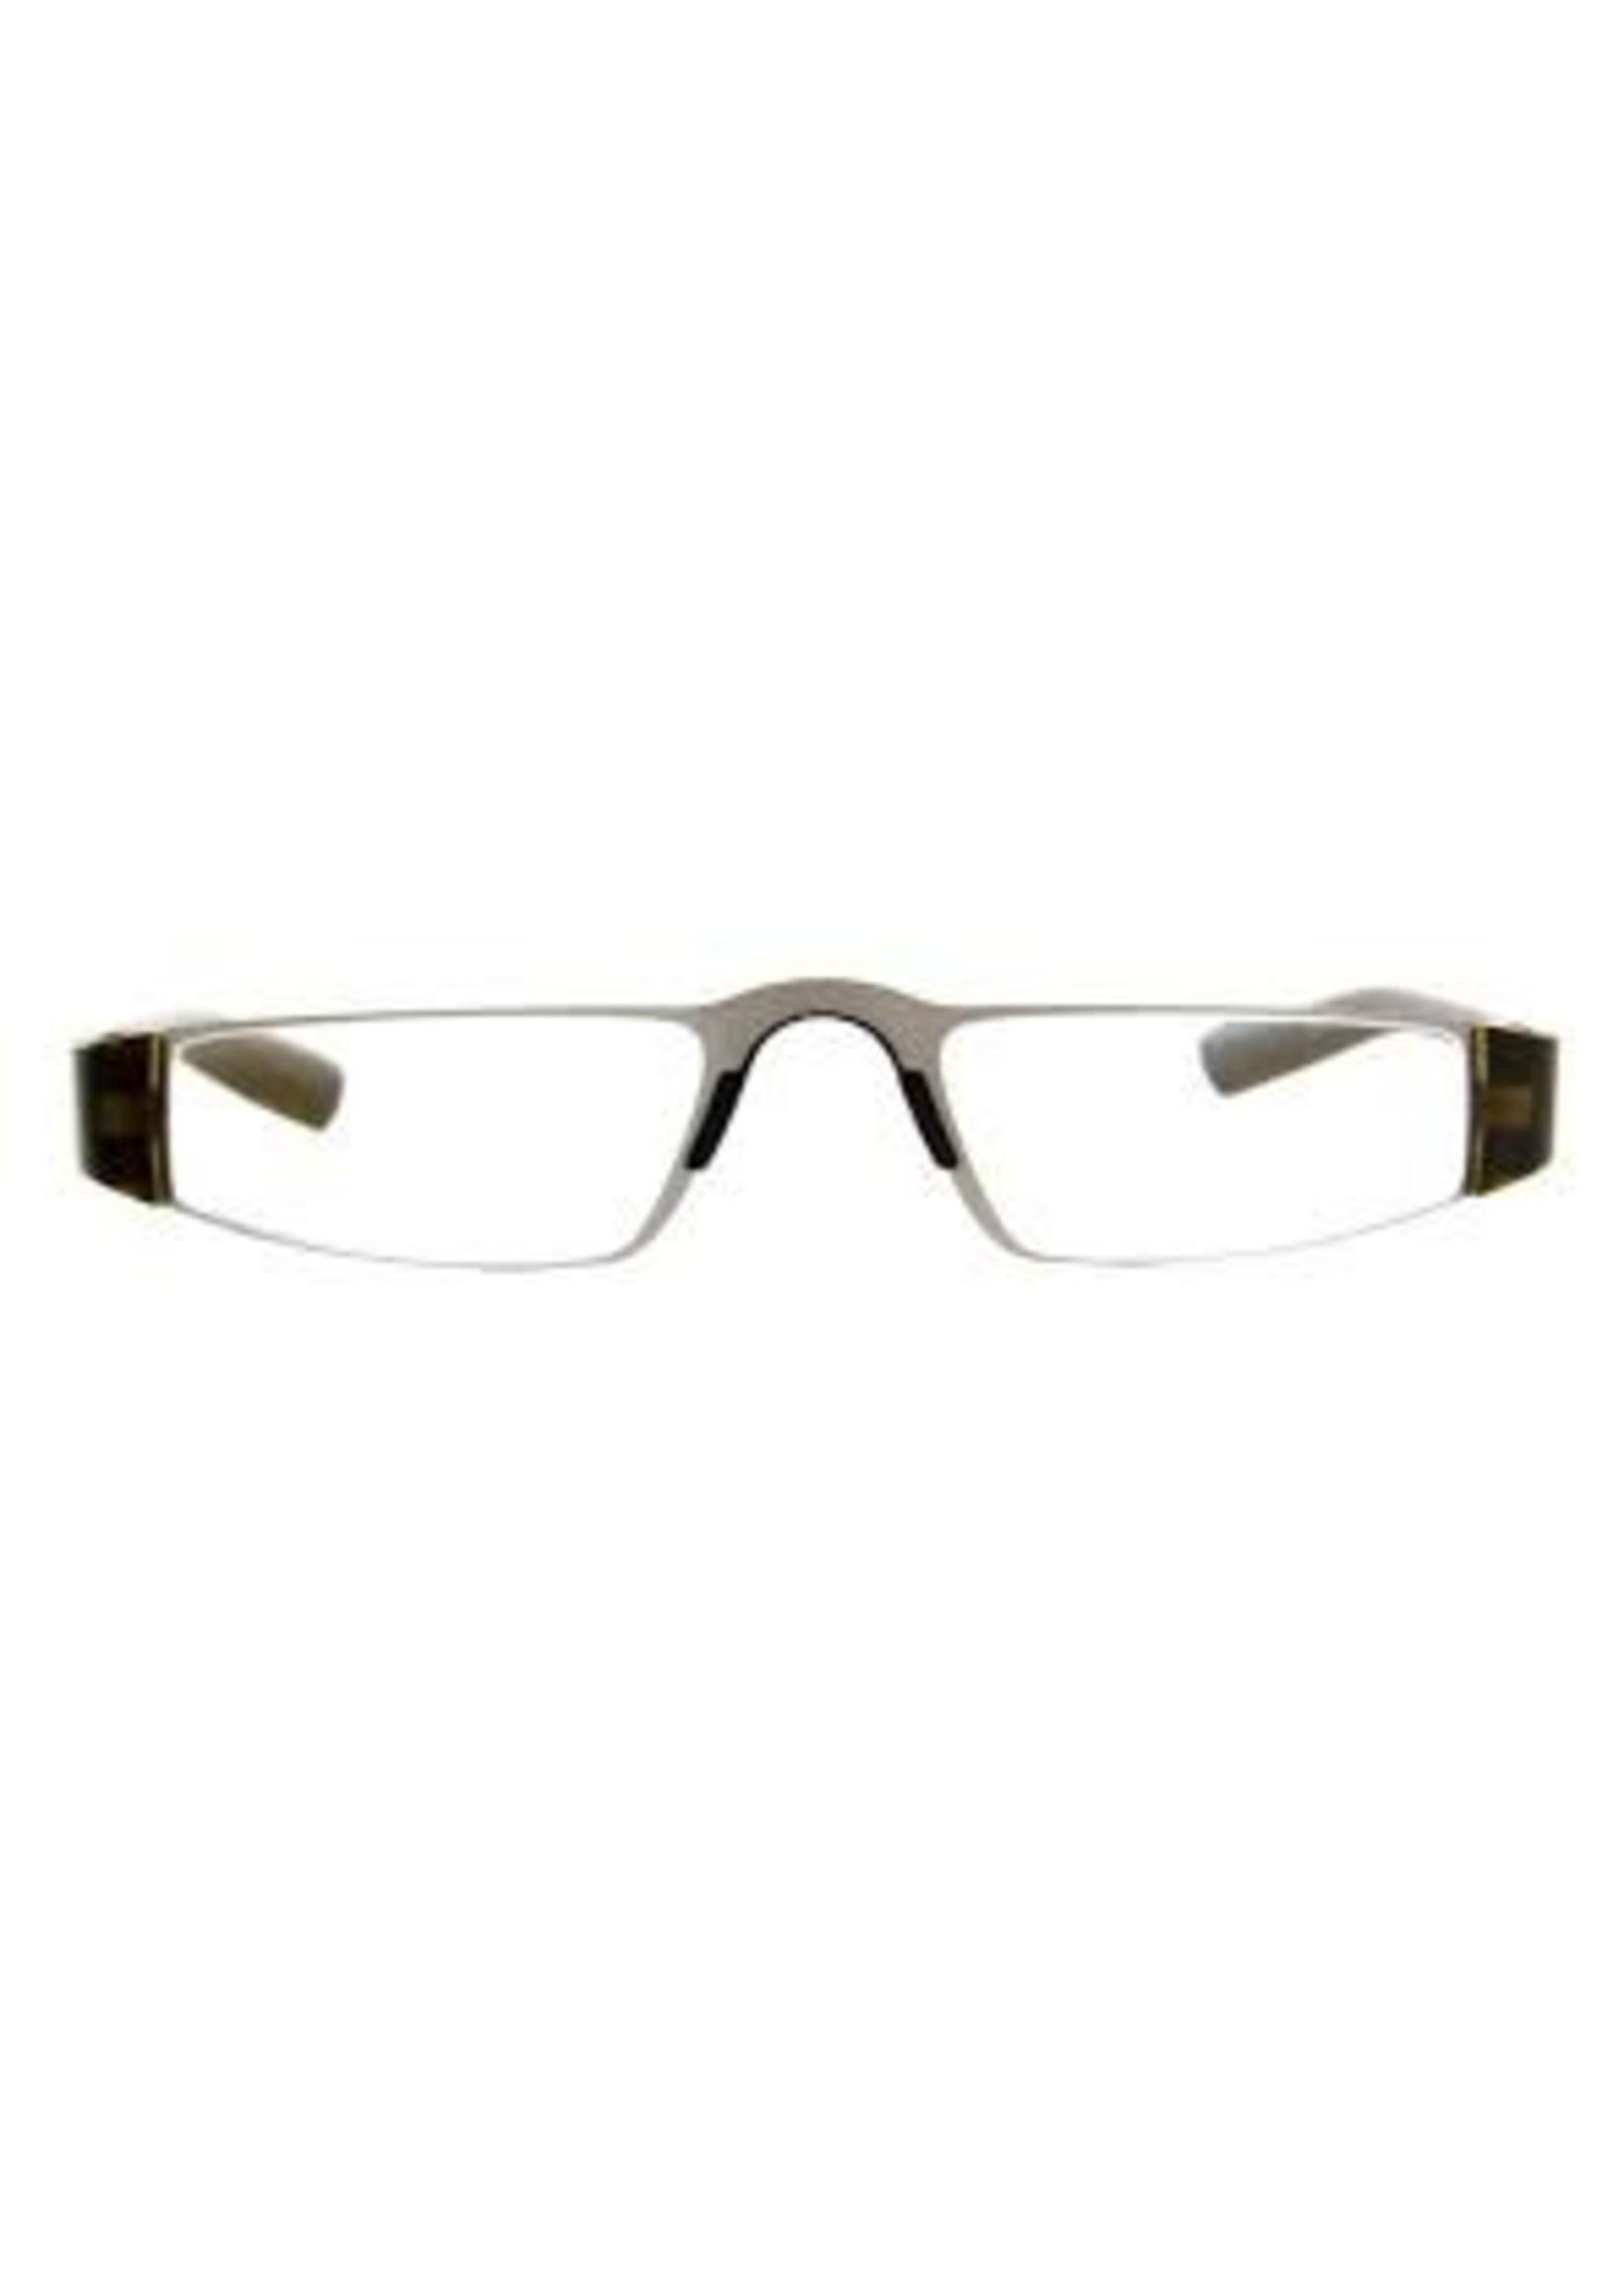 Porsche Design Leesbril Leesbril Porsche Design P8801A zwart/matzilver